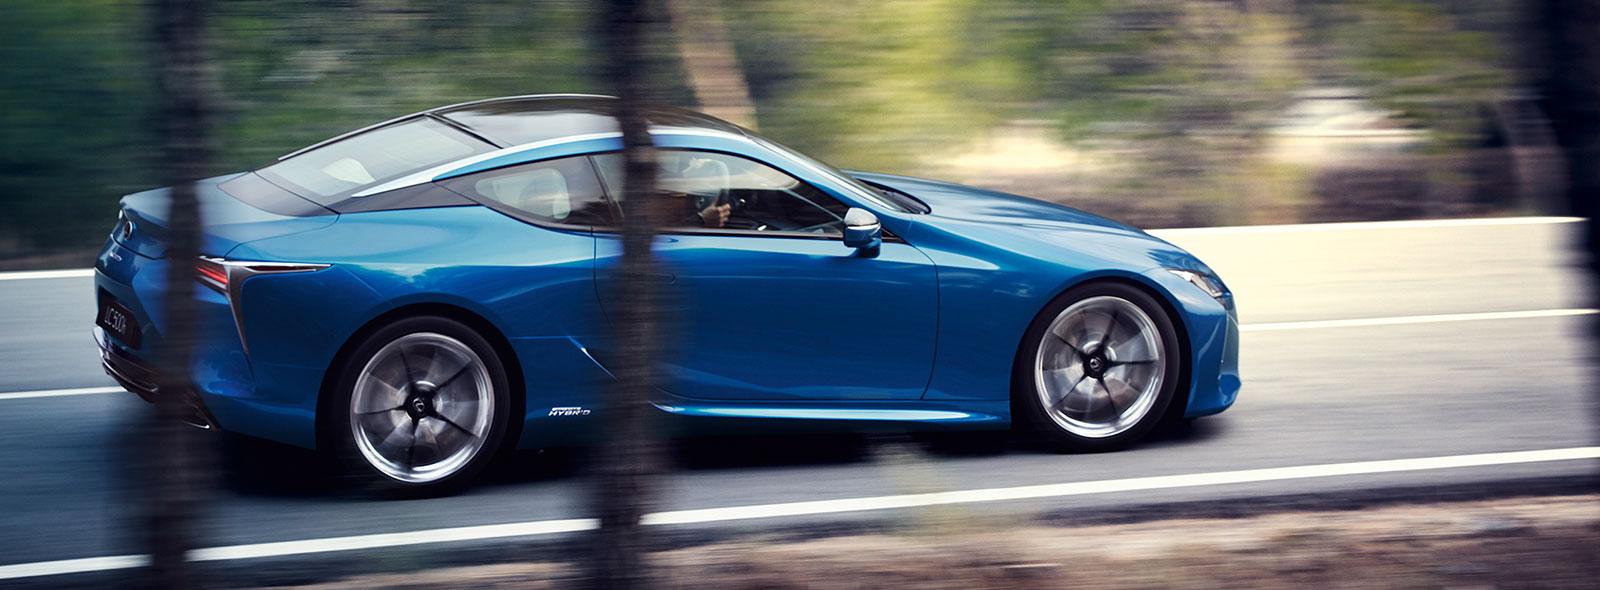 Blå Lexus LC 500h på landsväg